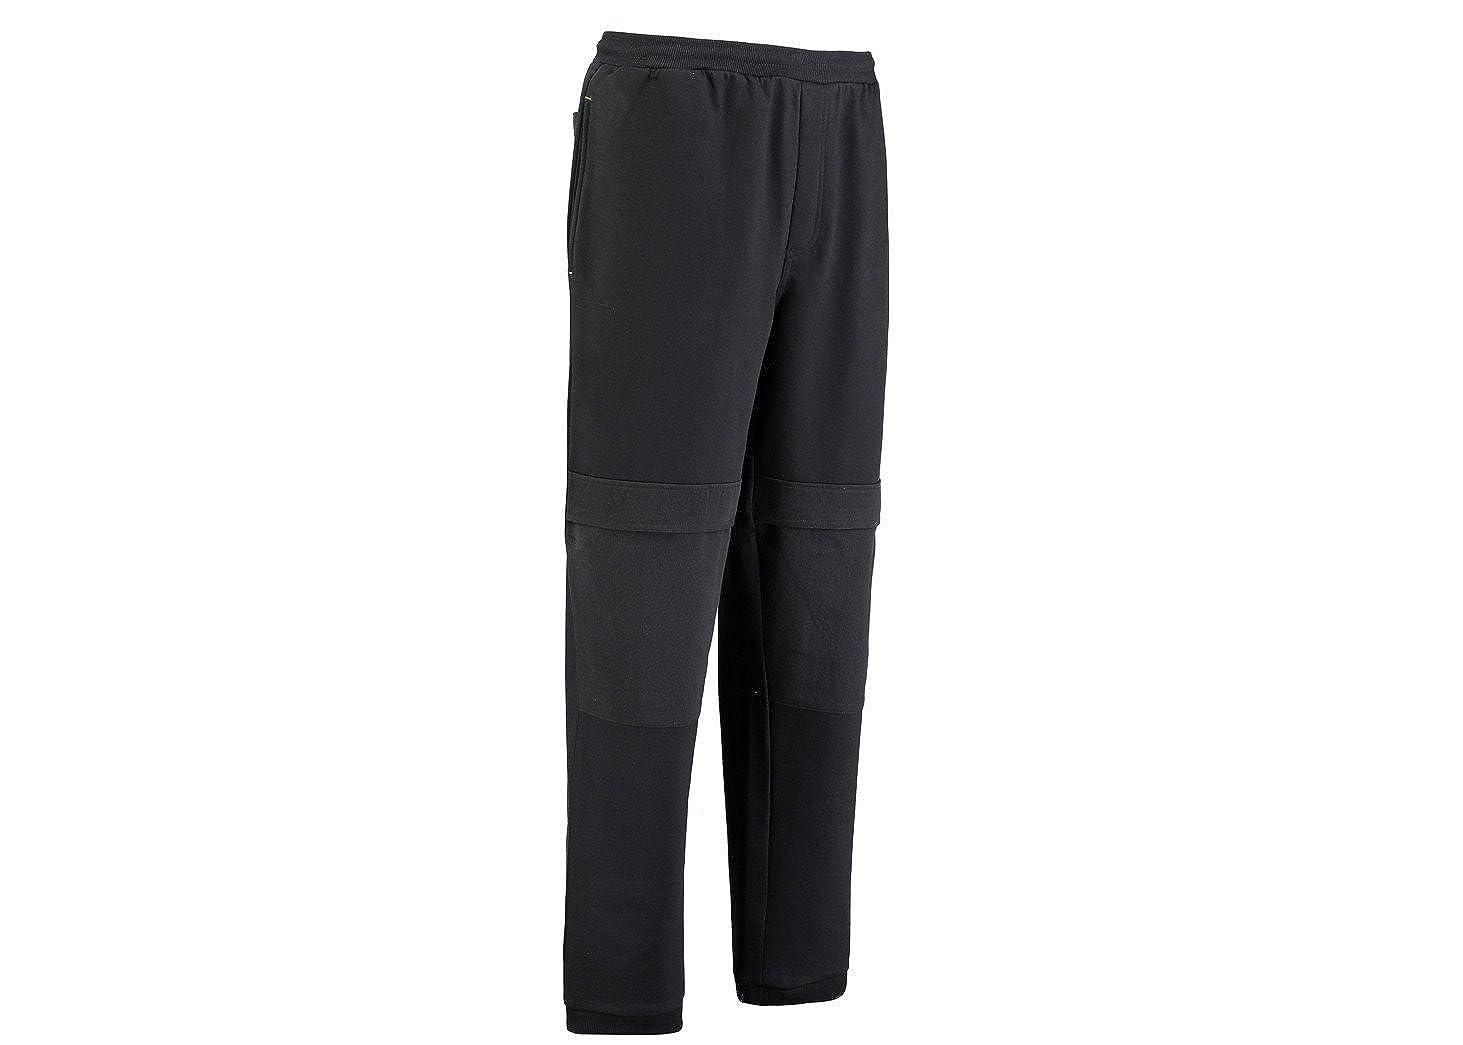 84ca600a66 Rhino Black Fleece Joggers Work Trousers With Knee Pad Pockets |  PMU006XLBlack: Amazon.co.uk: Clothing